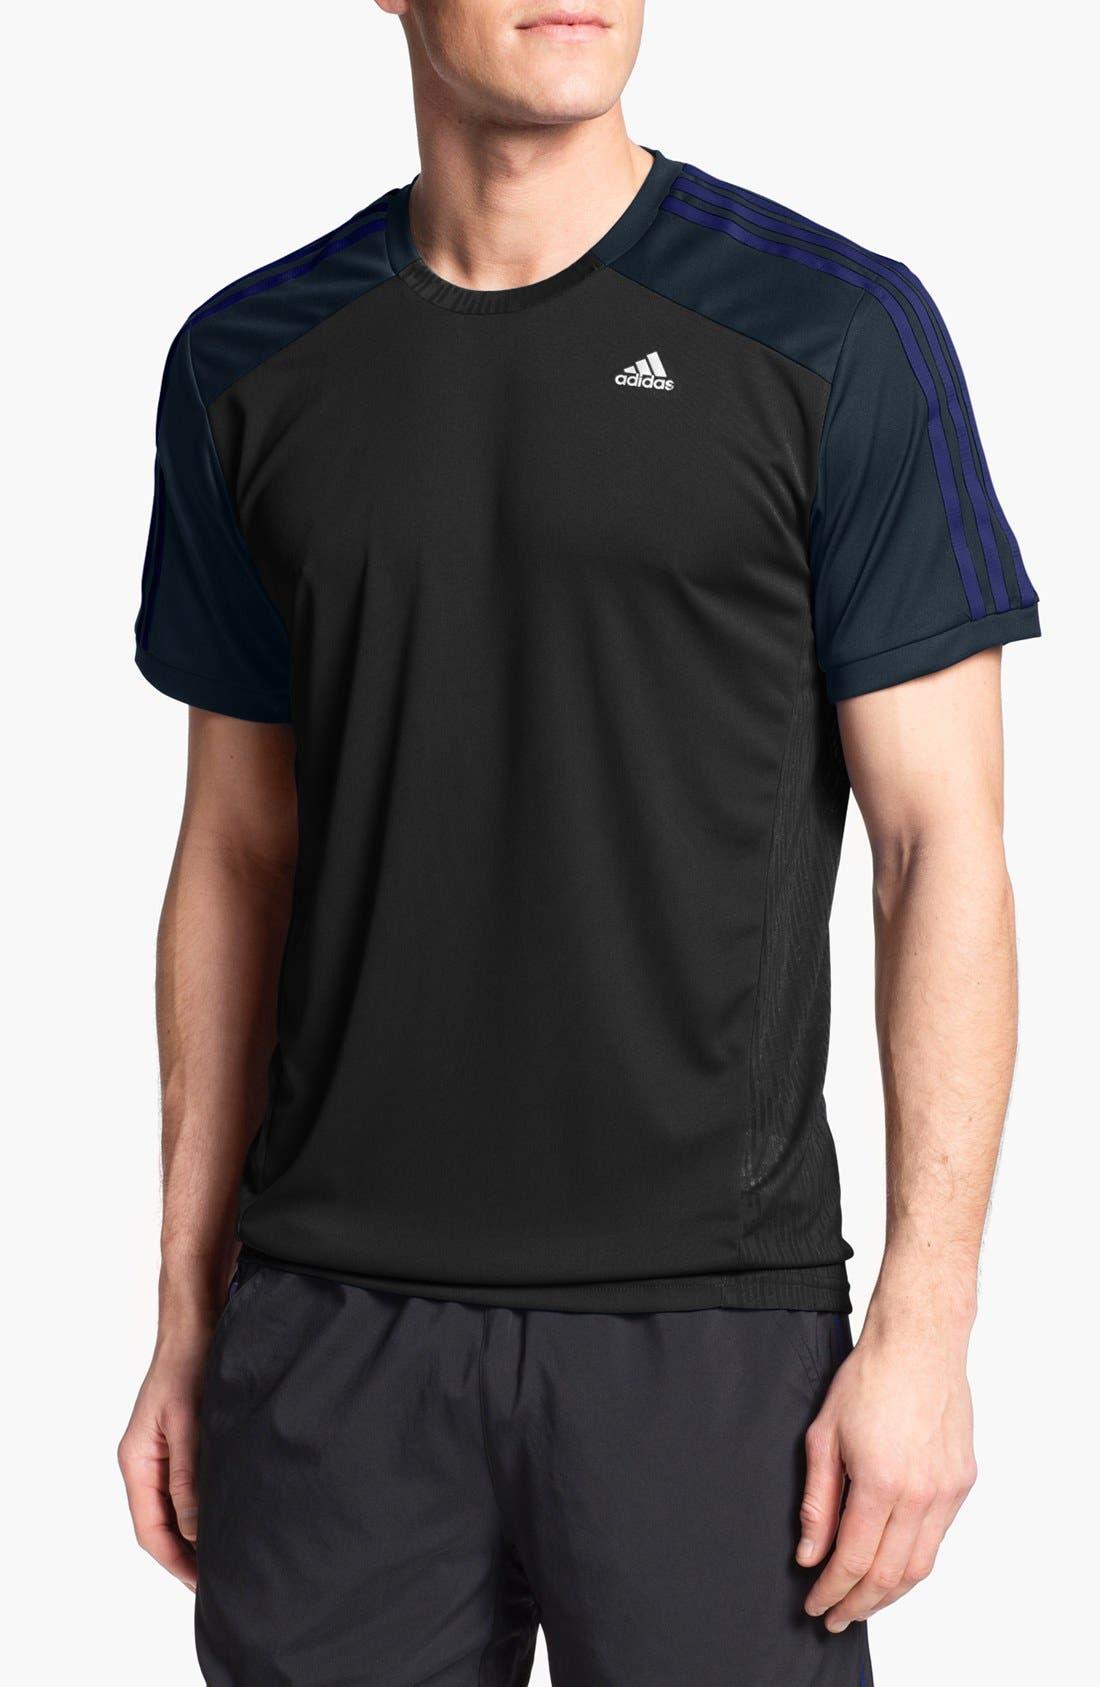 '365 Core' CLIMACOOL<sup>®</sup> T-Shirt,                         Main,                         color, Black/ Night Shade